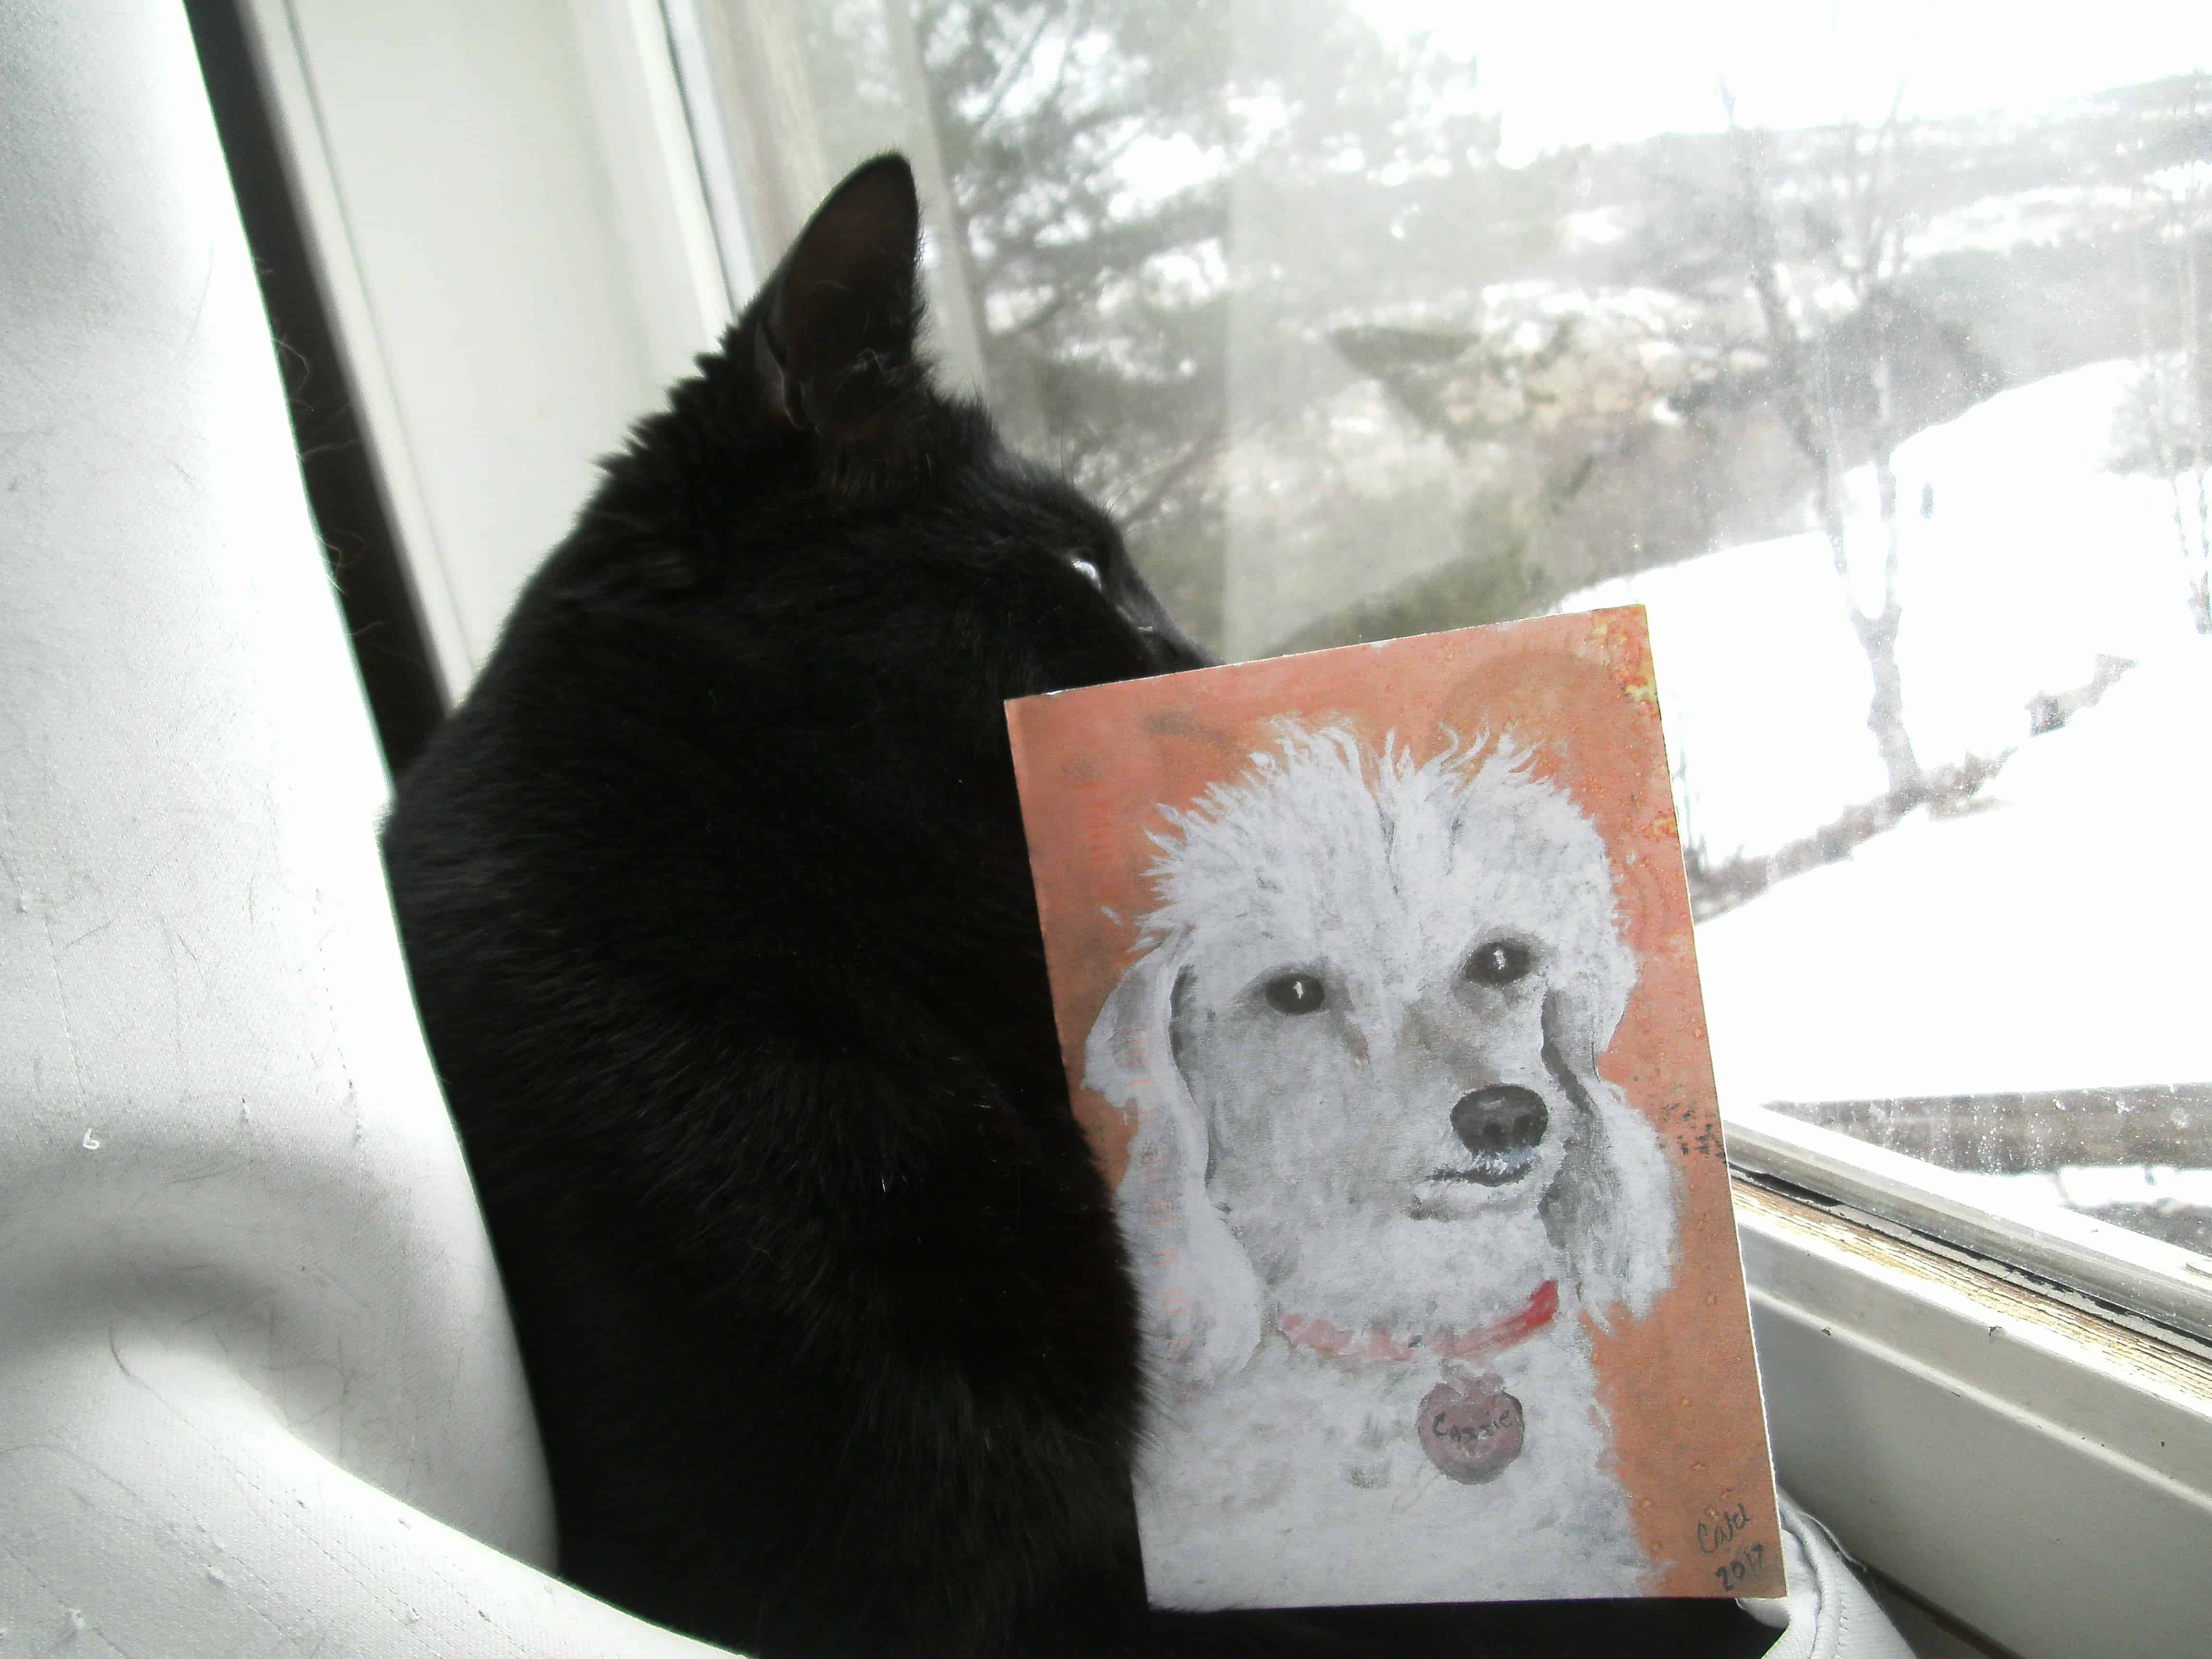 A painting of a dog by Cari Kurtz, USA